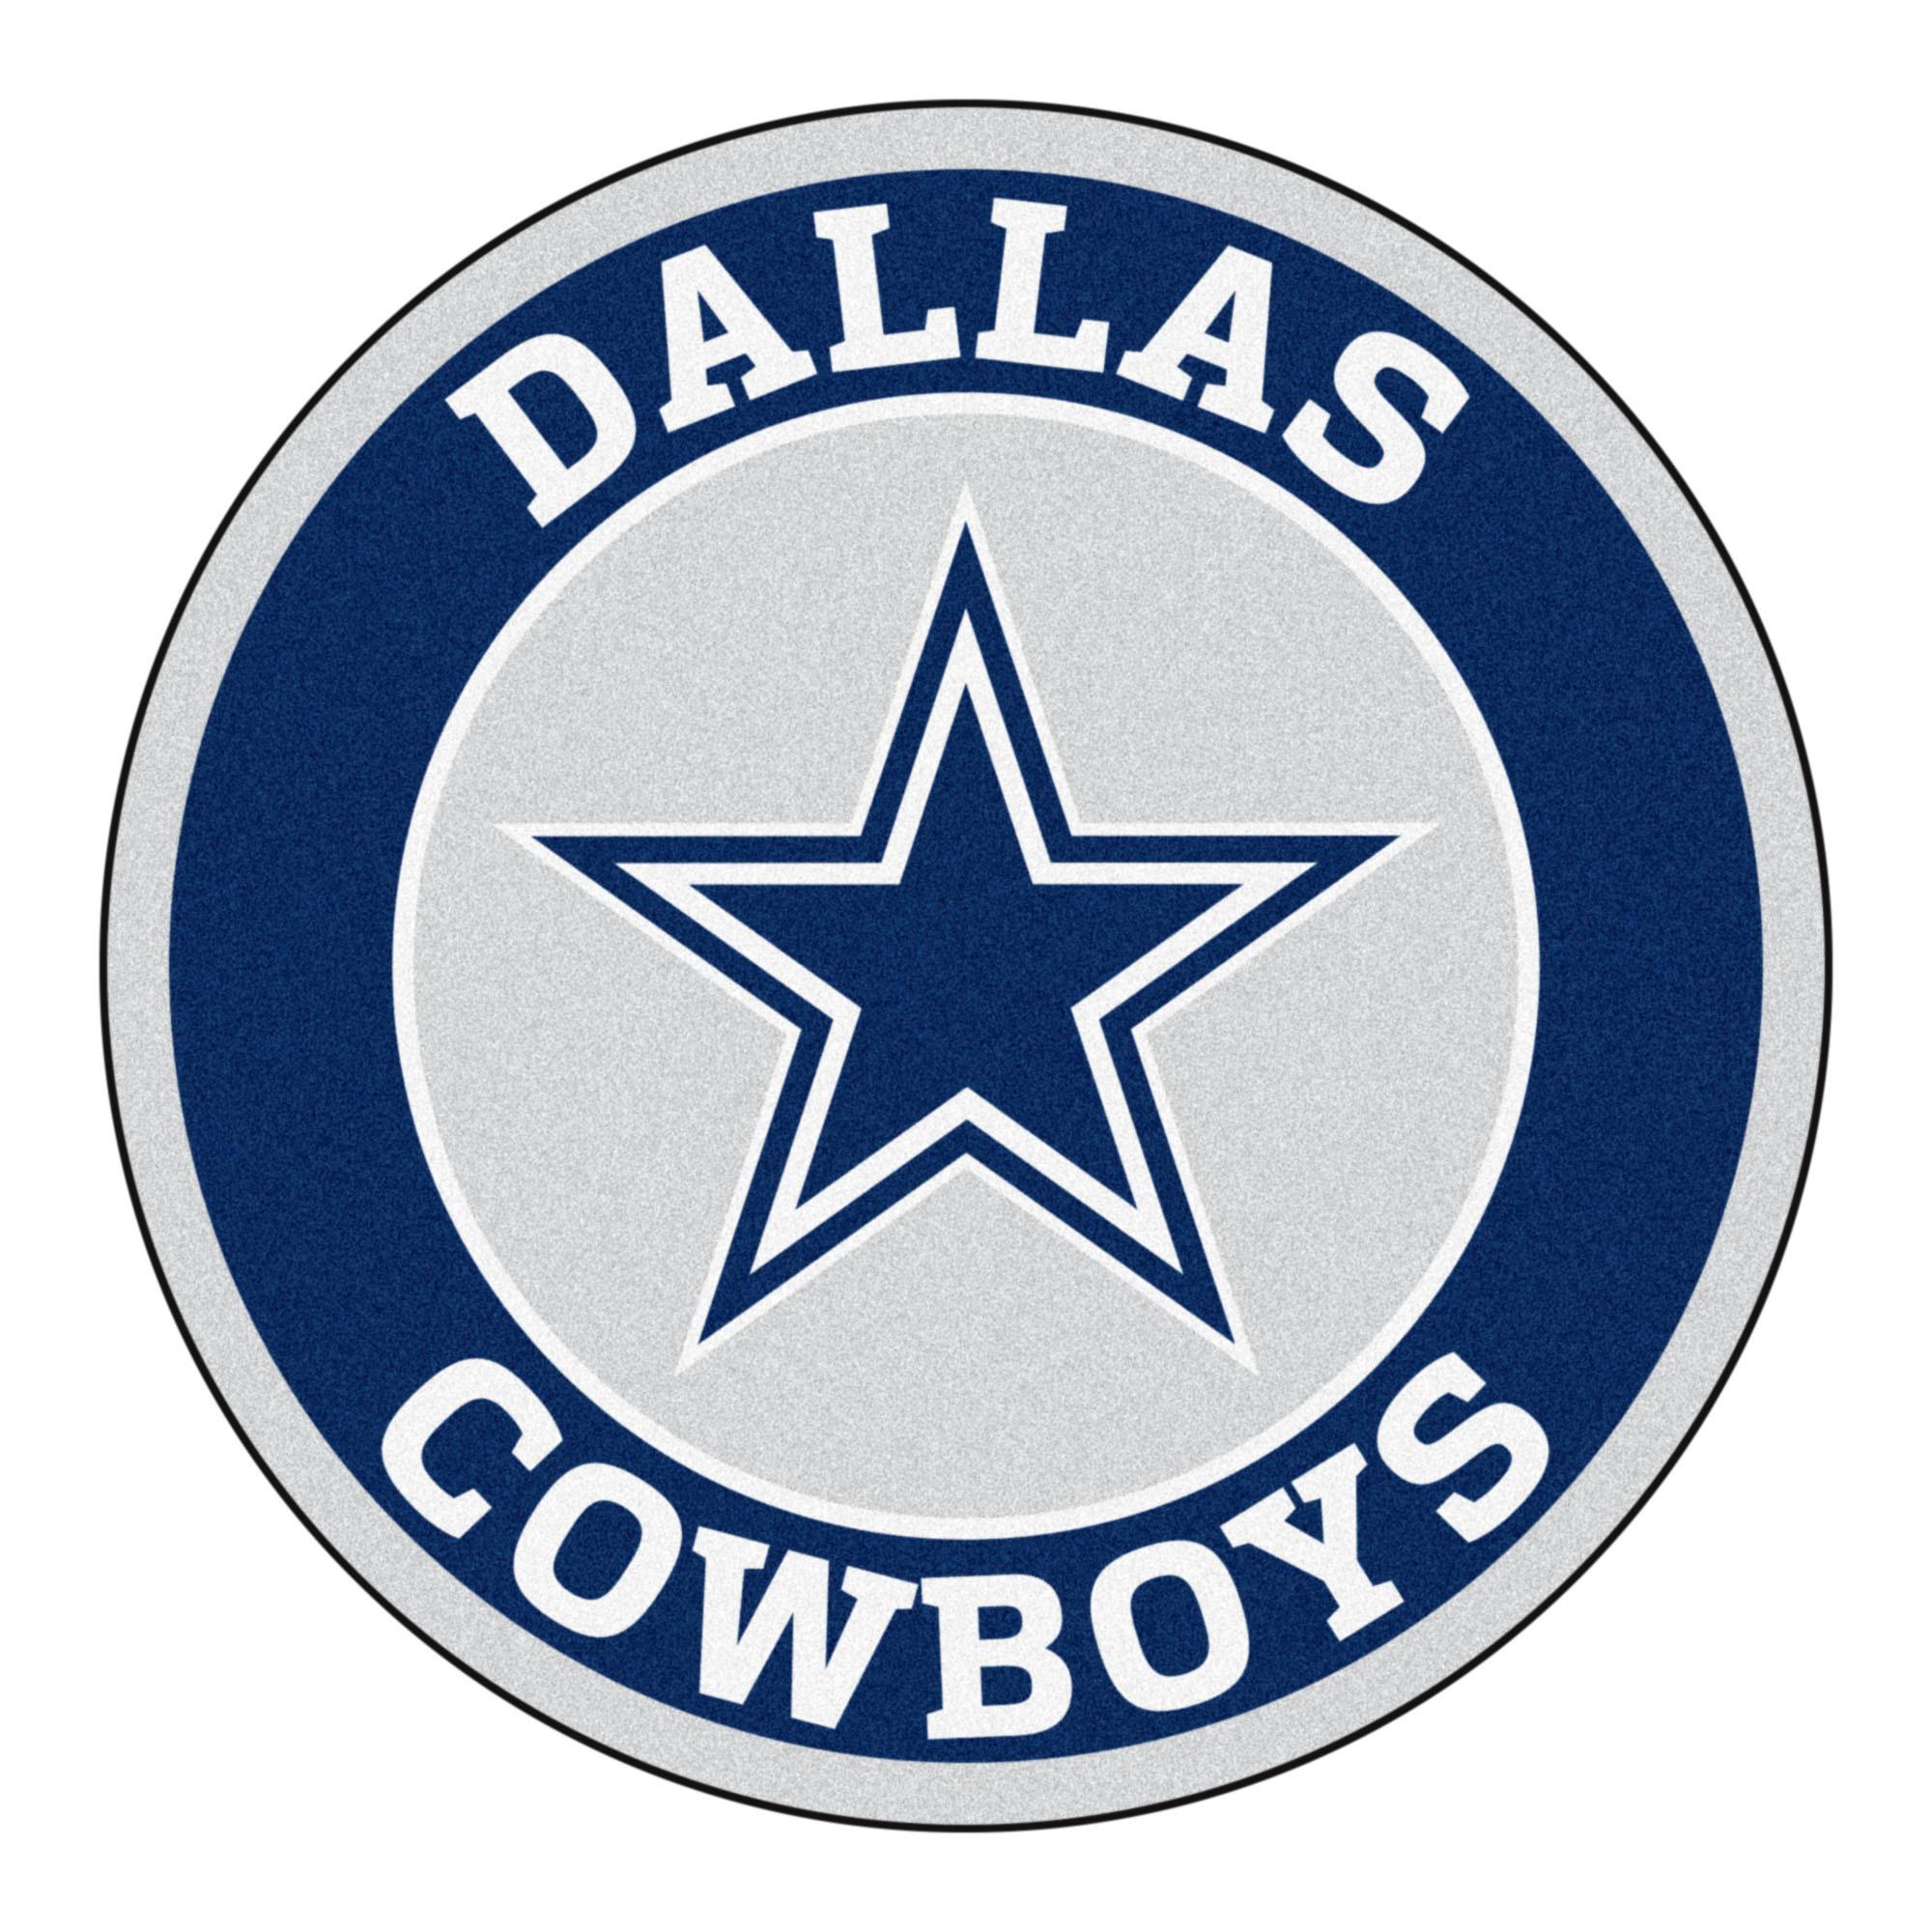 Dallas Cowboys Logo Wallpapers   PixelsTalk.Net. Dallas Cowboys Logo 2.2000  x 2000 px